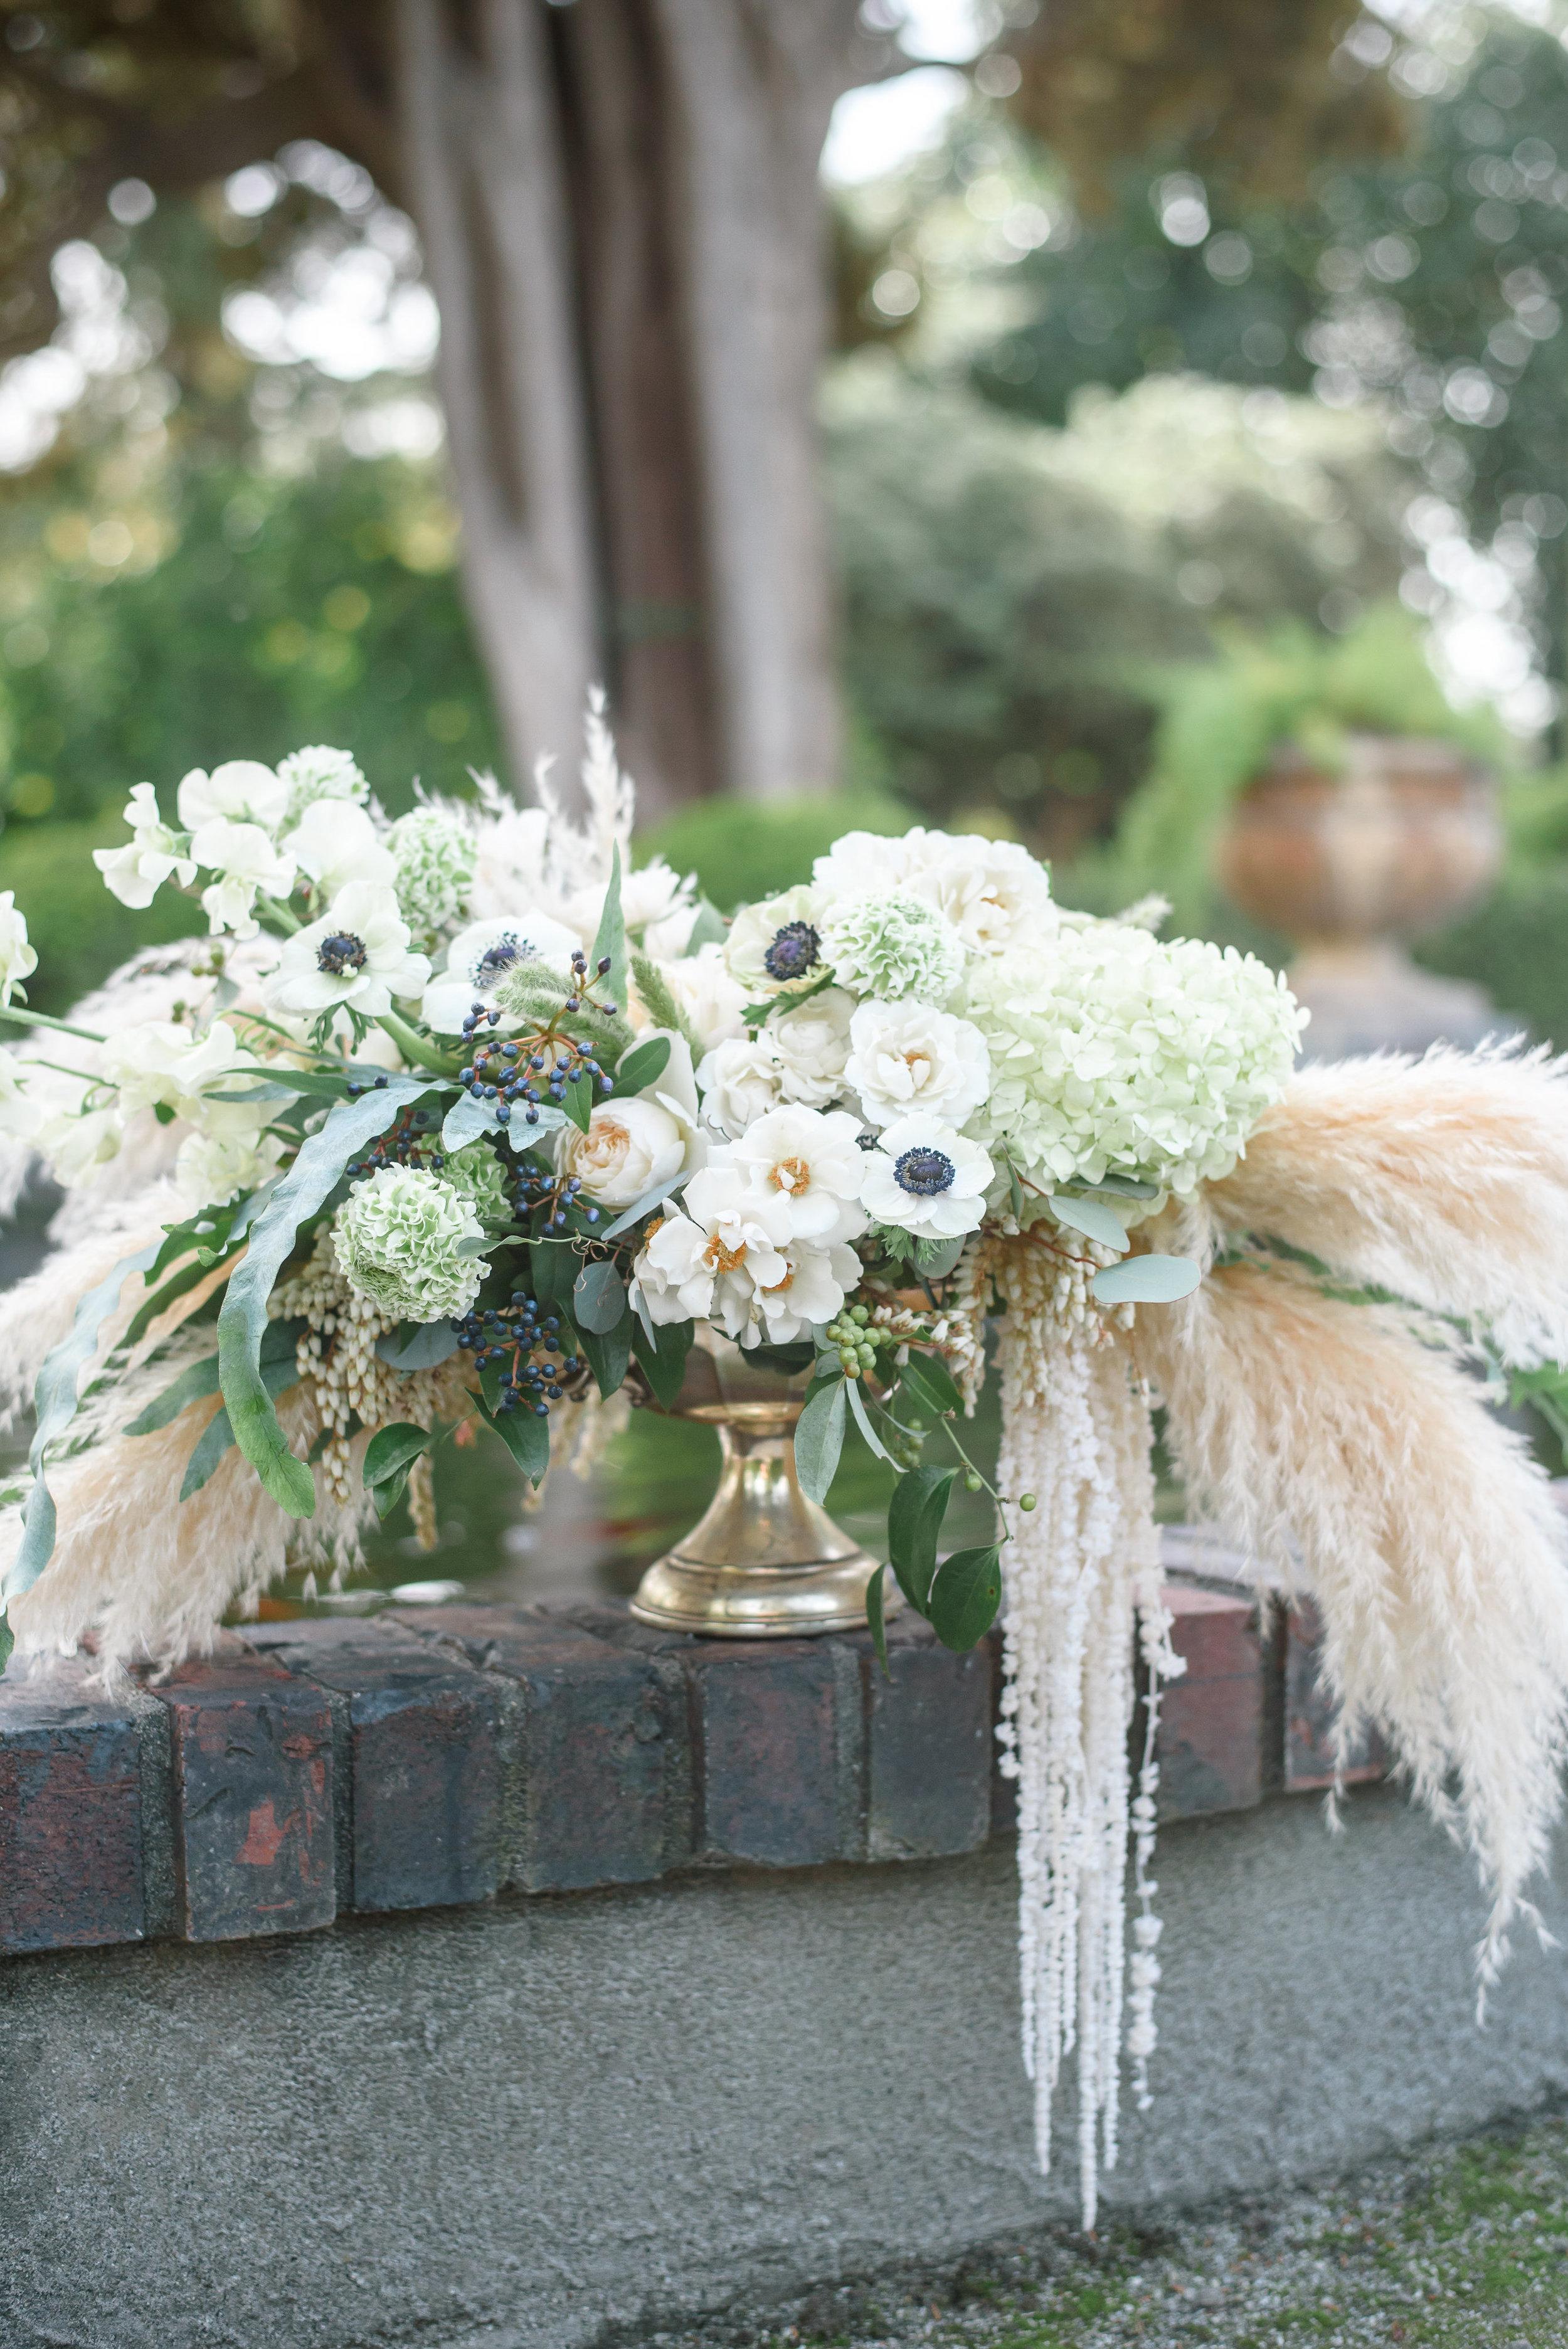 Unique Wedding Florals | Neutral Wedding Flowers | Pampas Grass | Anemones